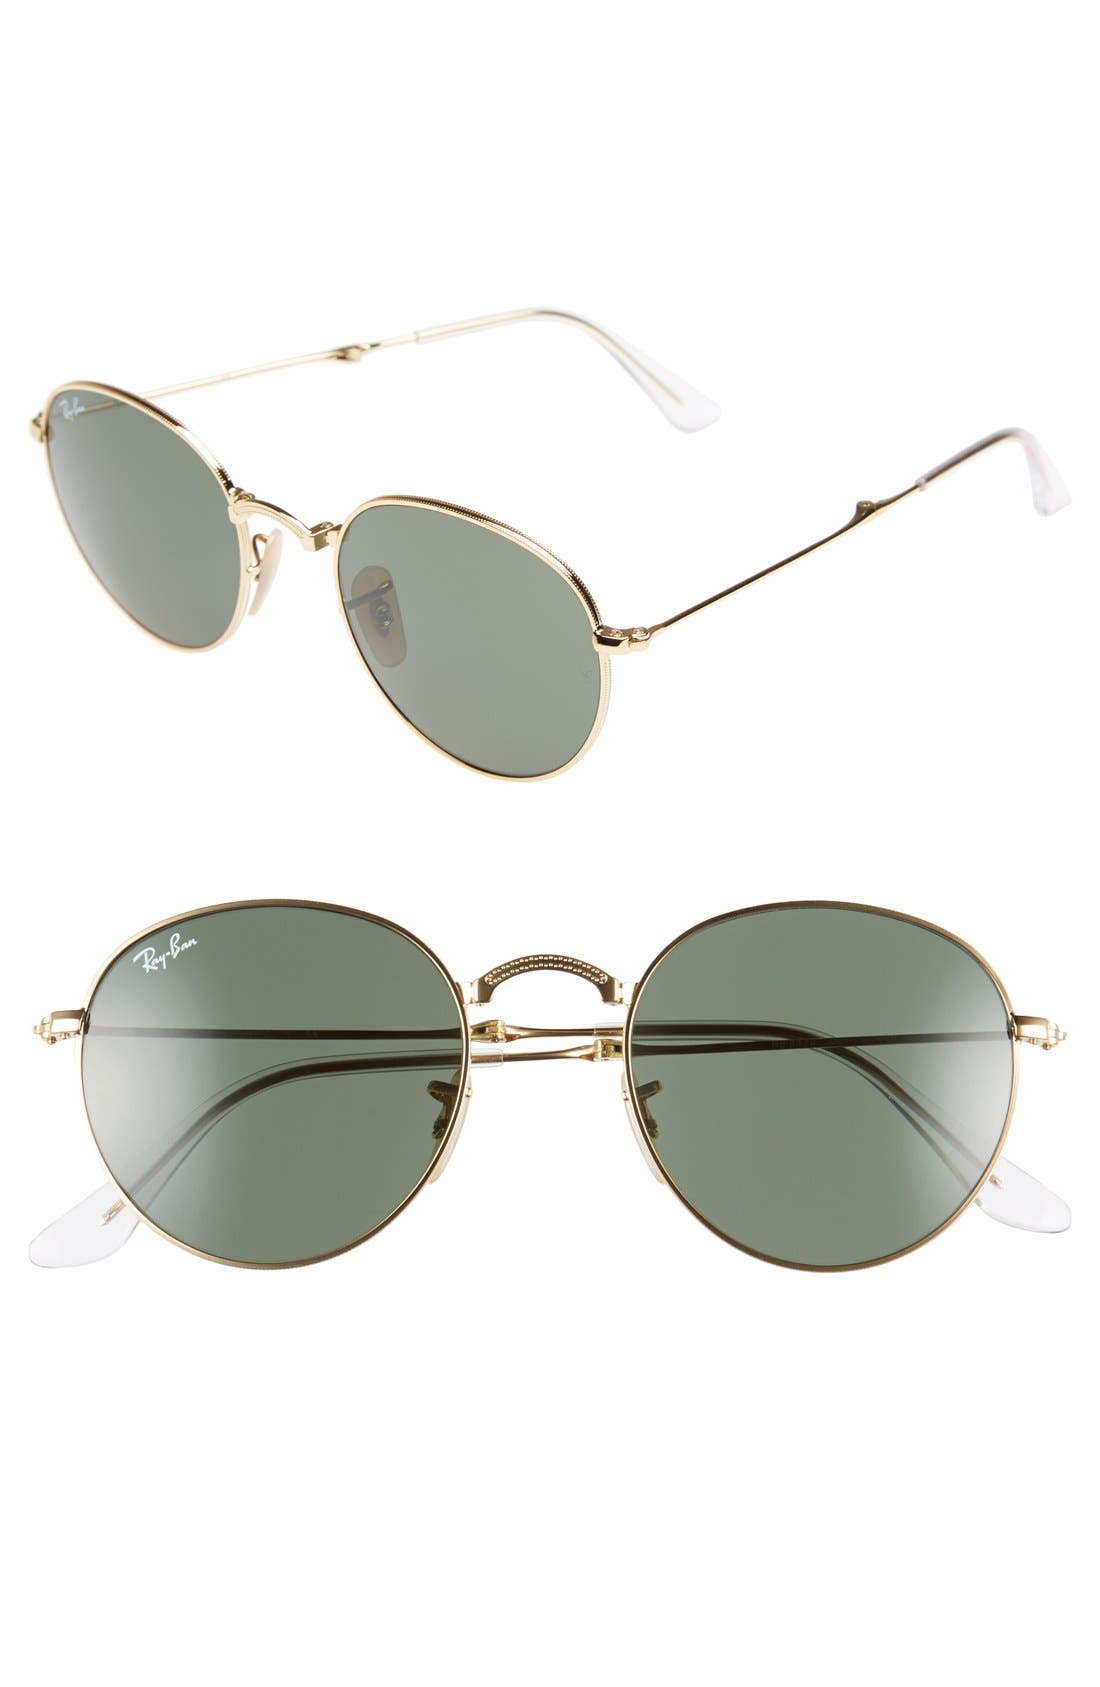 RAY-BAN Icons 50mm Folding Sunglasses